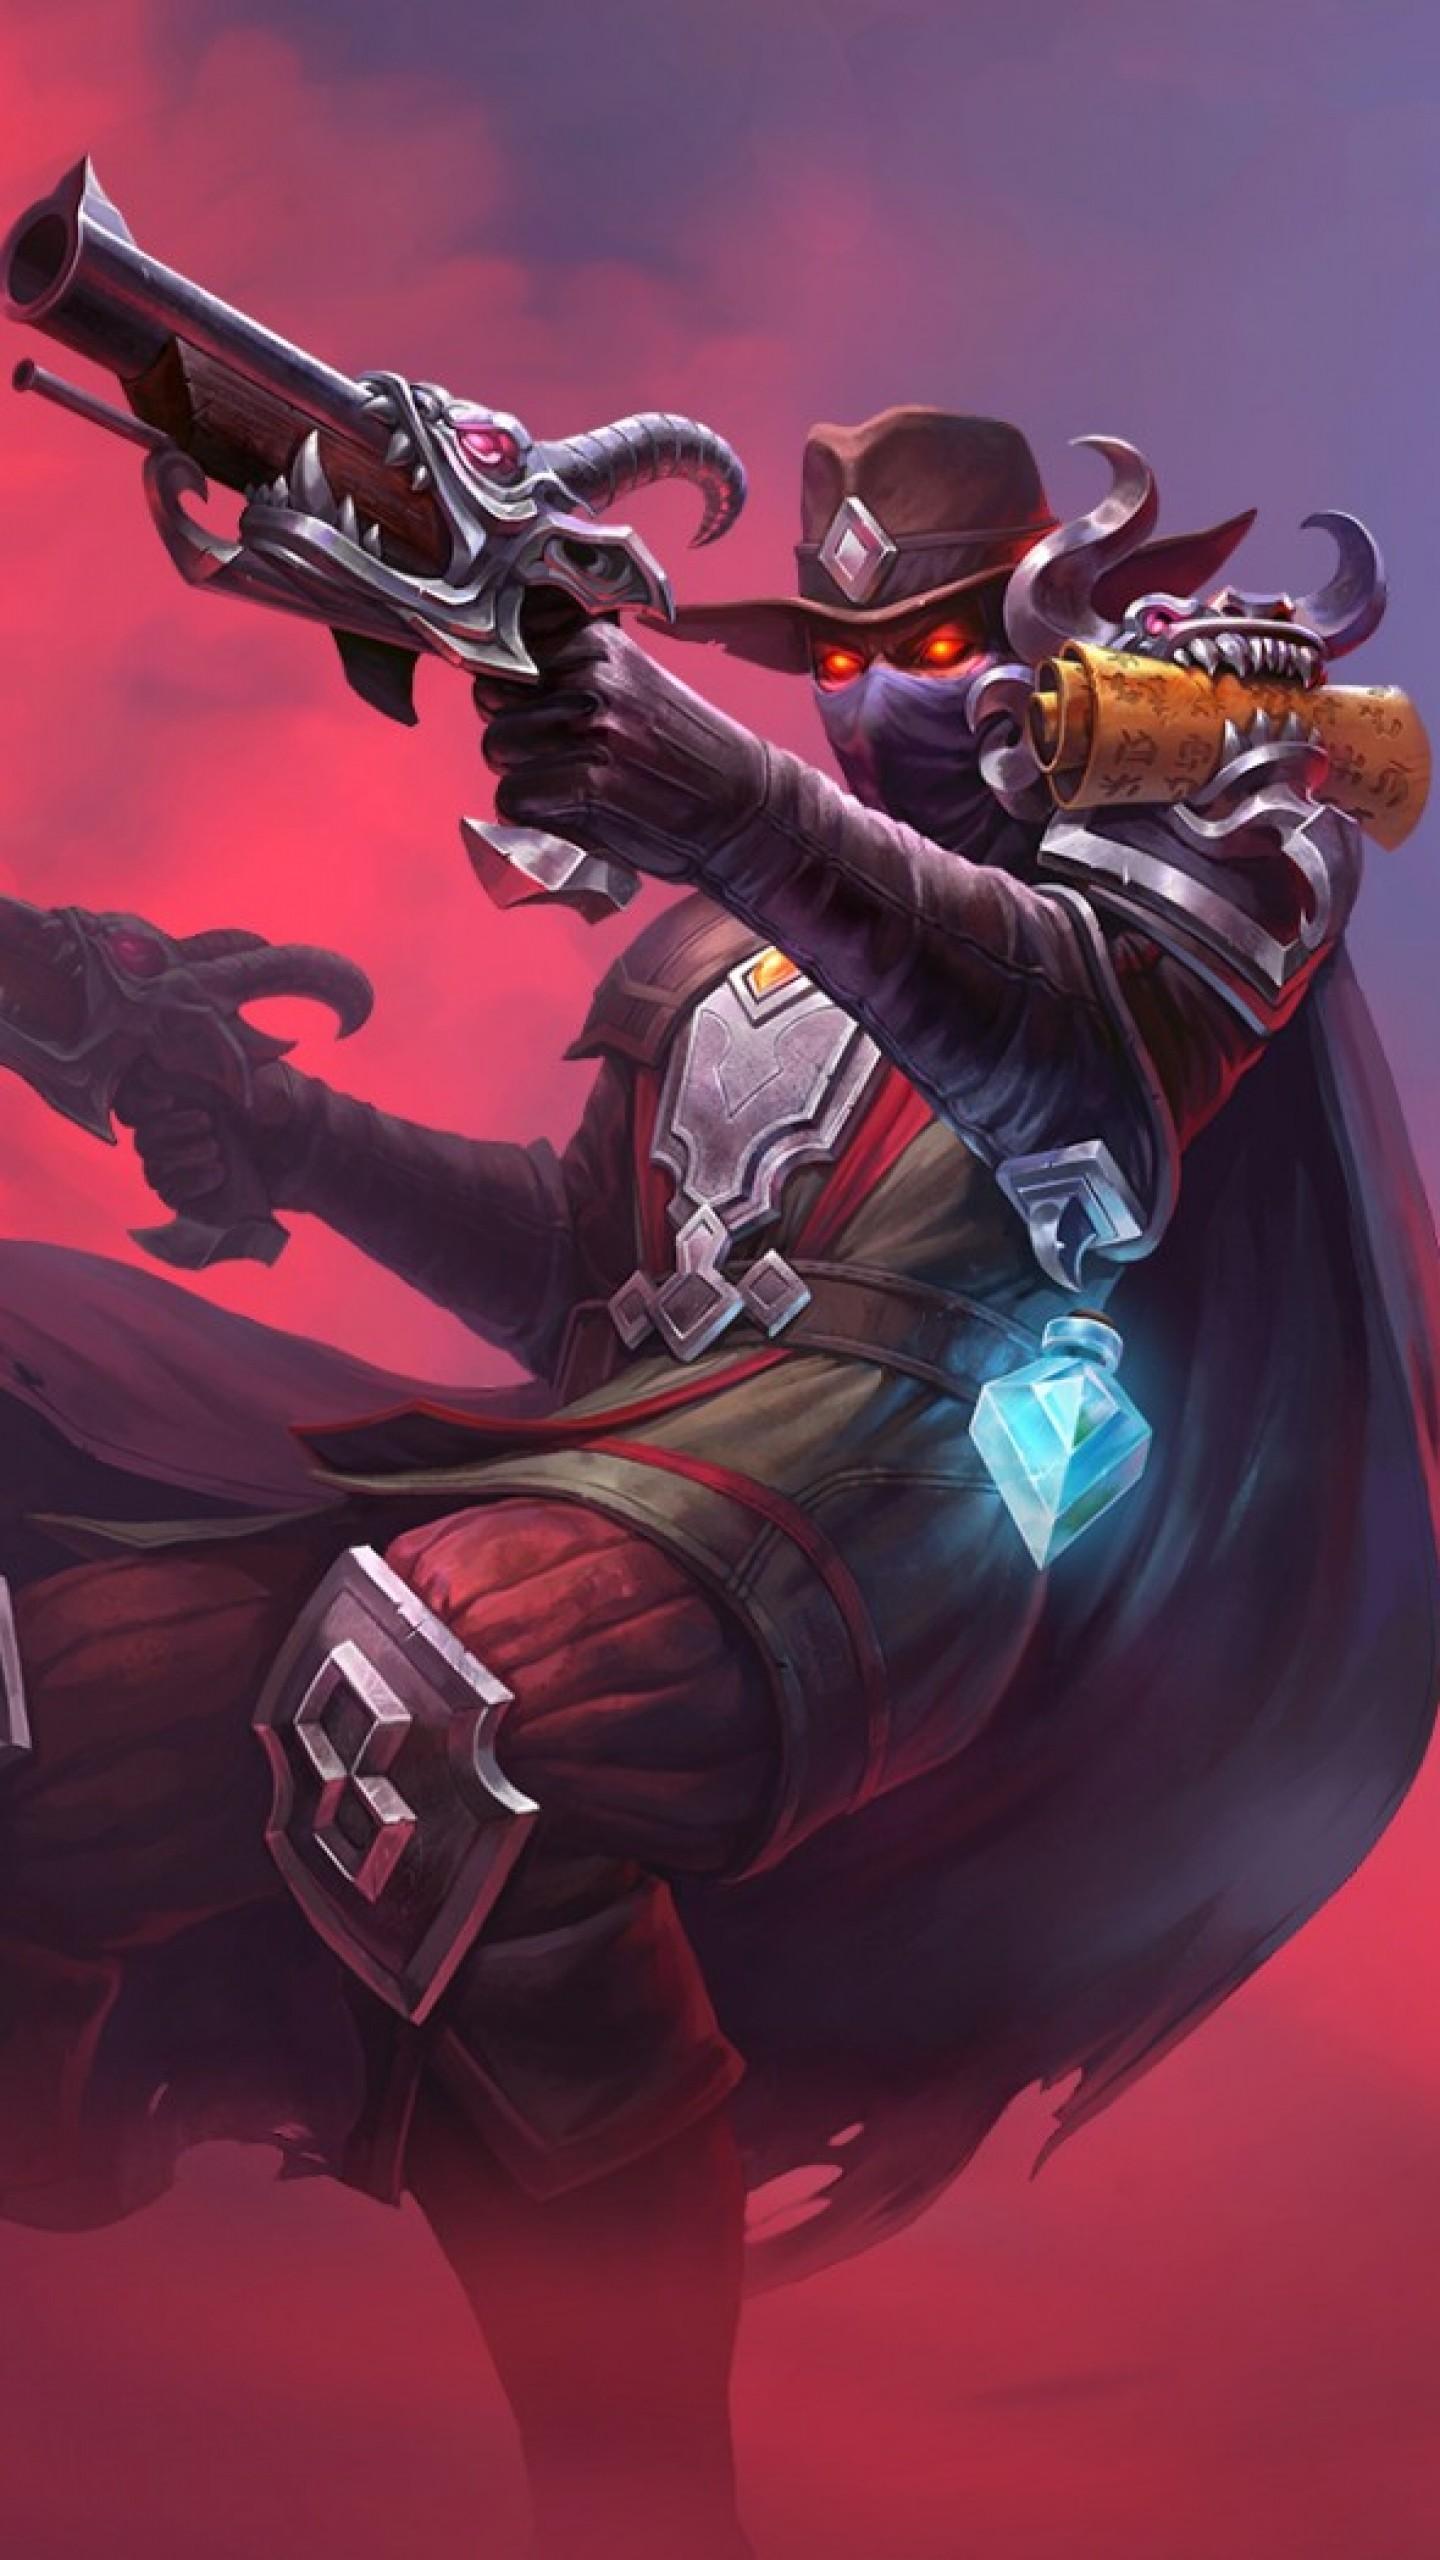 Preview wallpaper juggernaut wars, weapons, art, cowboy 1440×2560